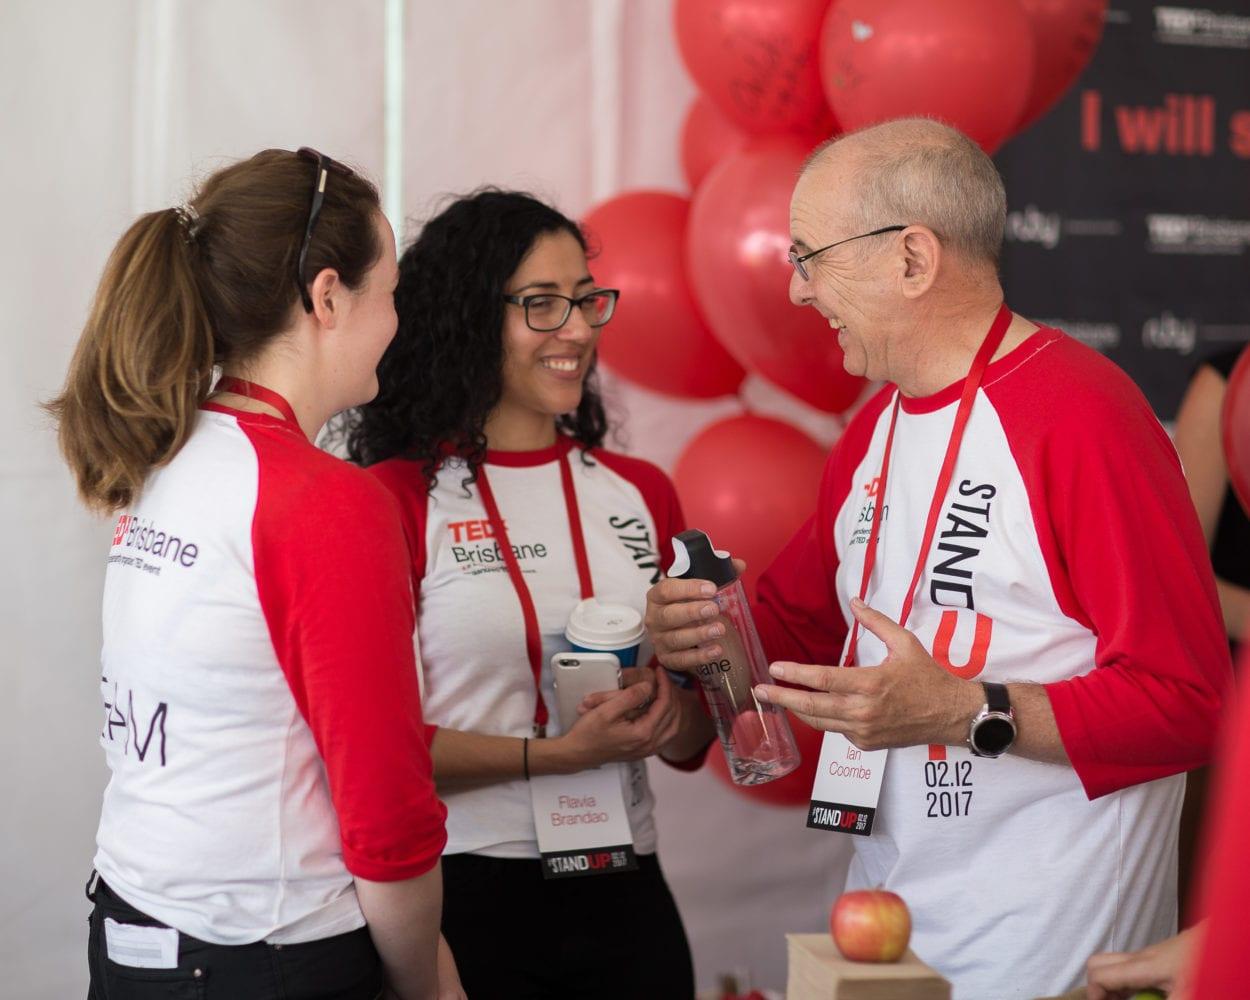 TEDx Brisbane Advocates - Flavia Ian Coombe